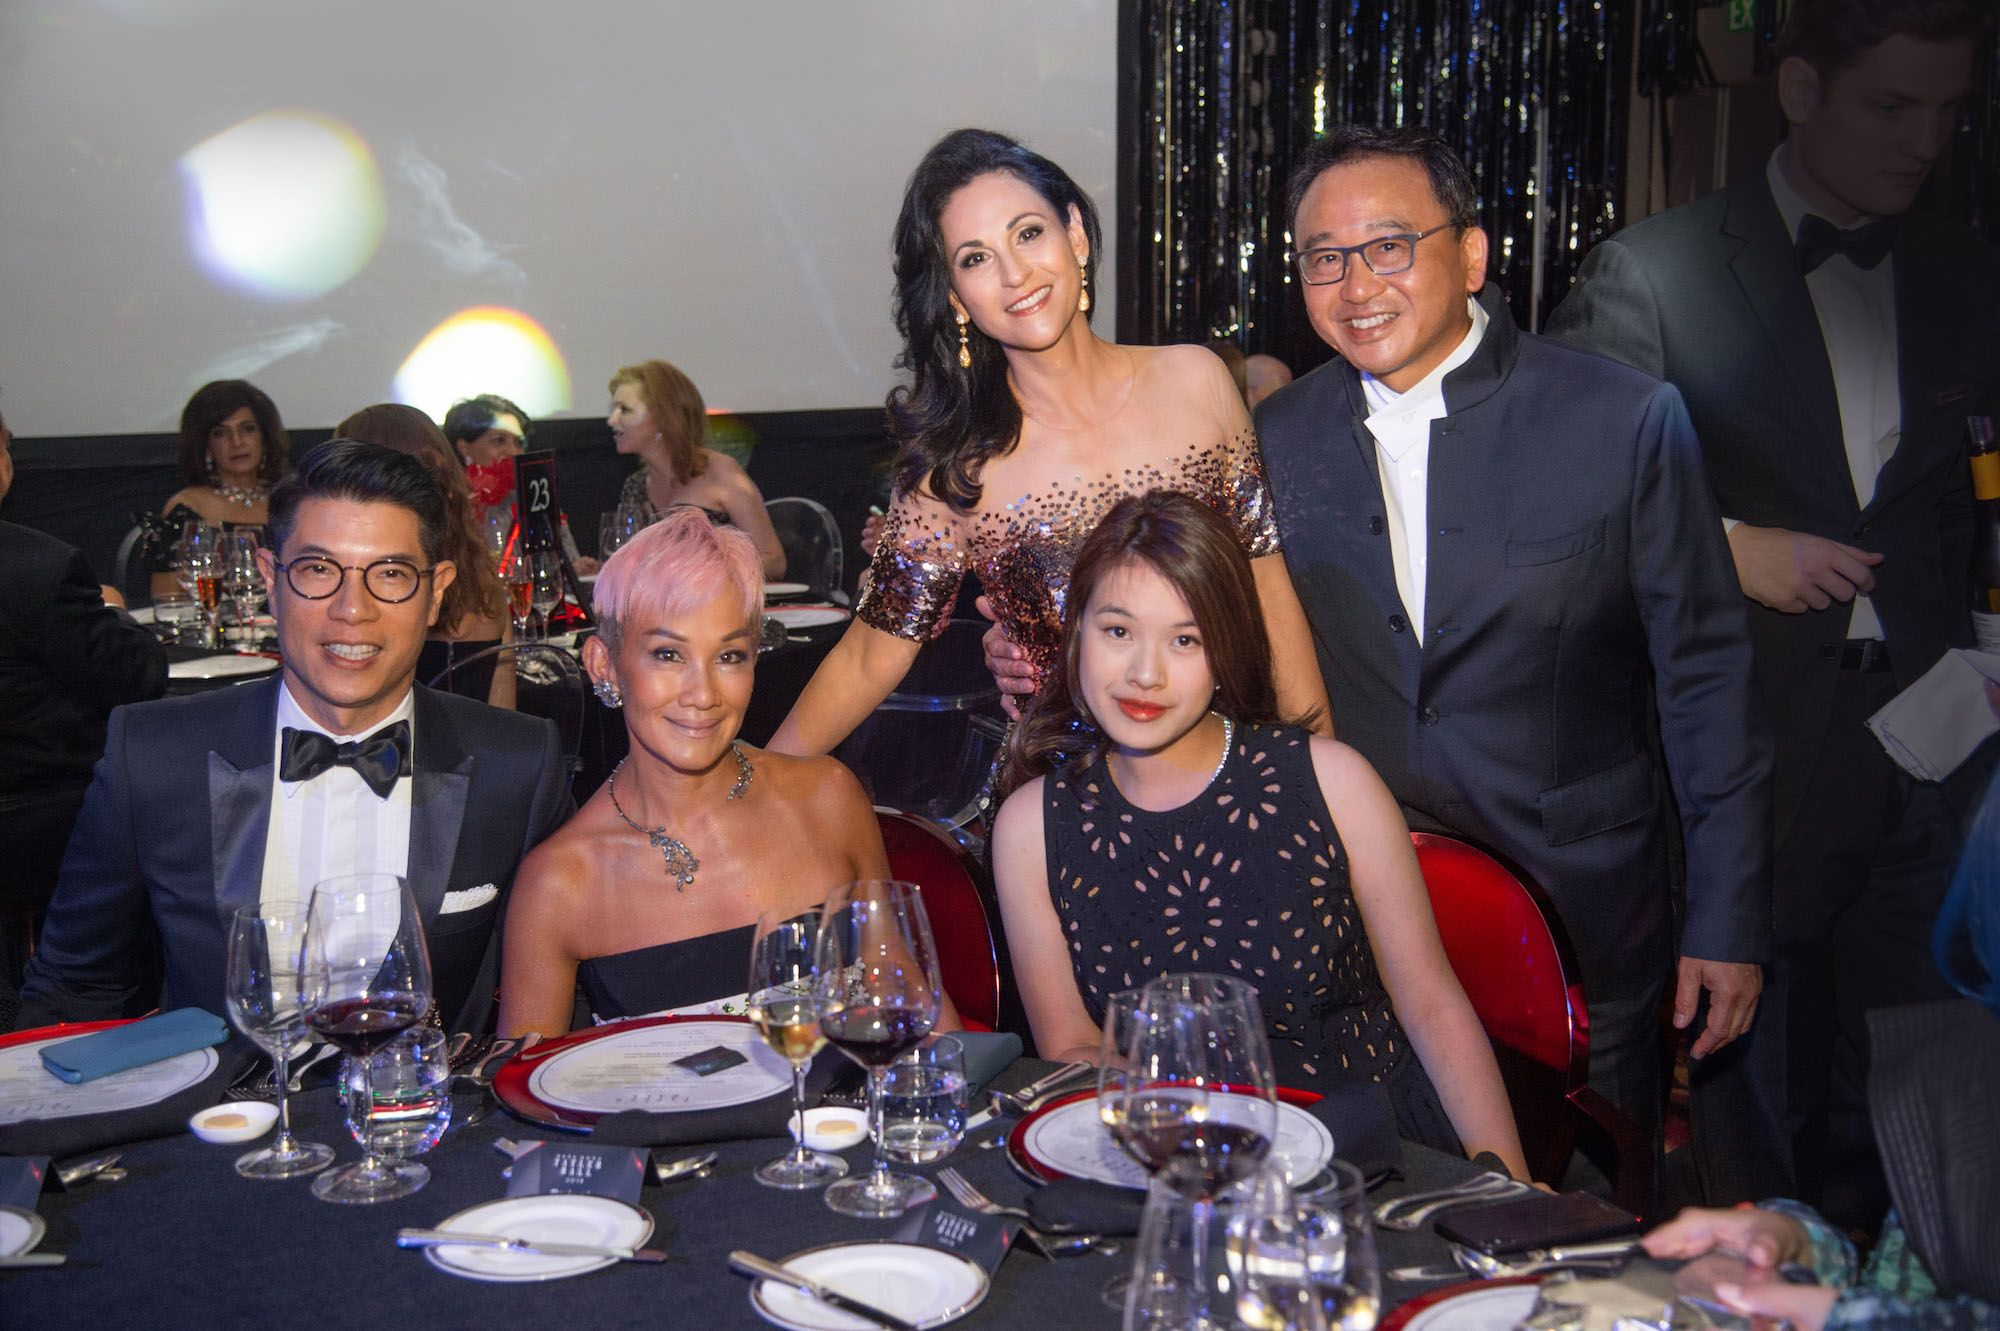 Standing - Mahnaz Lee, David Lee. Seated - Benjamin Lau, Marie-Christine Lee-Louey, Alexandra Louey